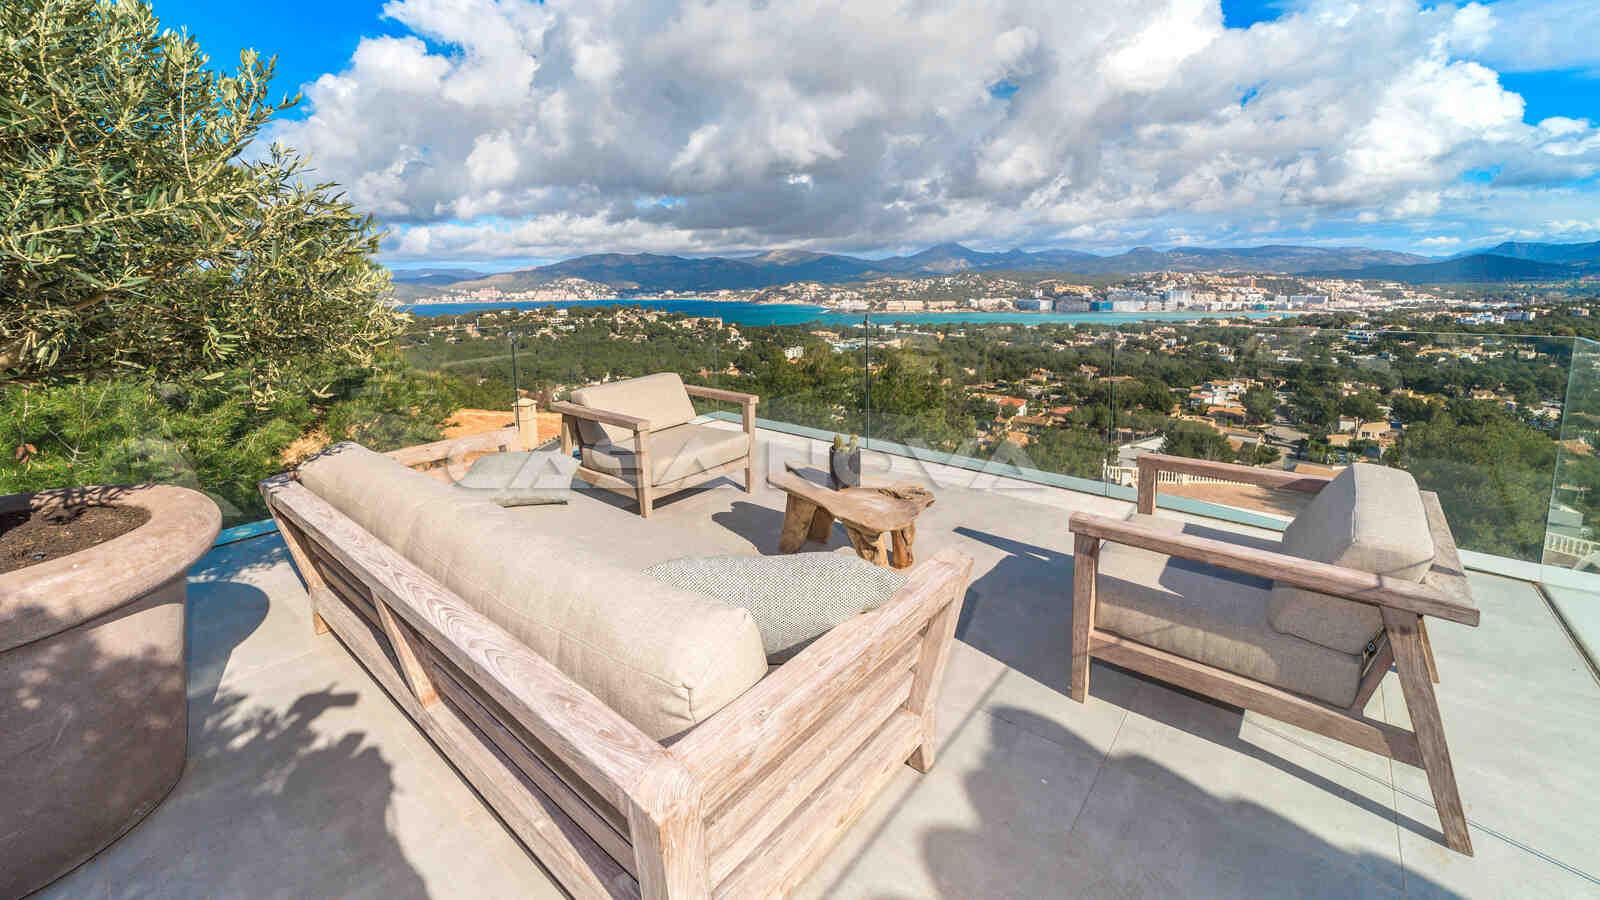 Meerblick Terrasse mit Chillout- Bereich